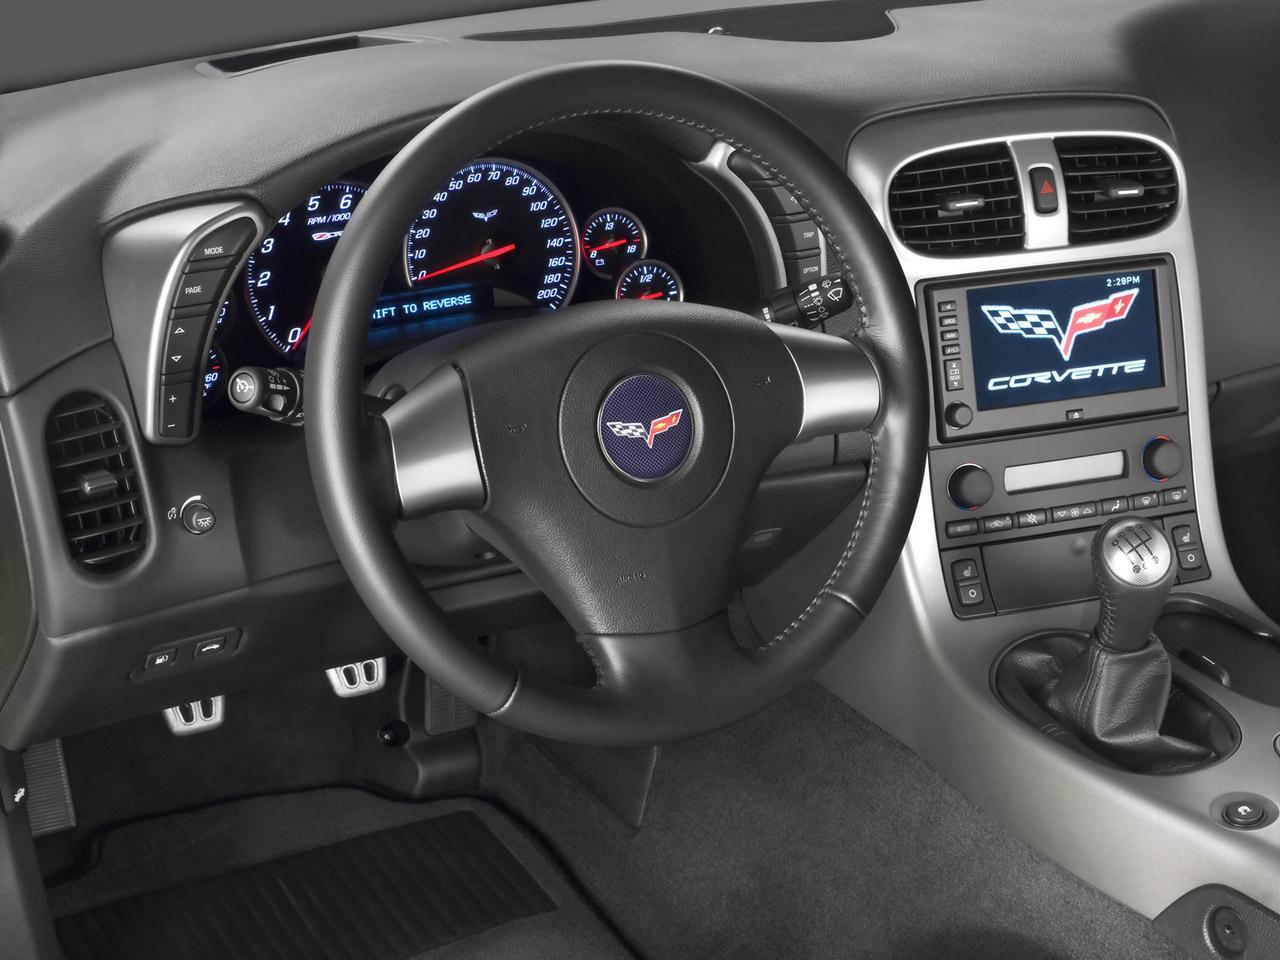 http://4.bp.blogspot.com/-uDl3d4i2Uy0/UKI49fOc_9I/AAAAAAAAG1k/Et3XjFdnTQA/s1600/2006-Chevrolet-Corvette-Z06-Dashboard-1280x960.jpg